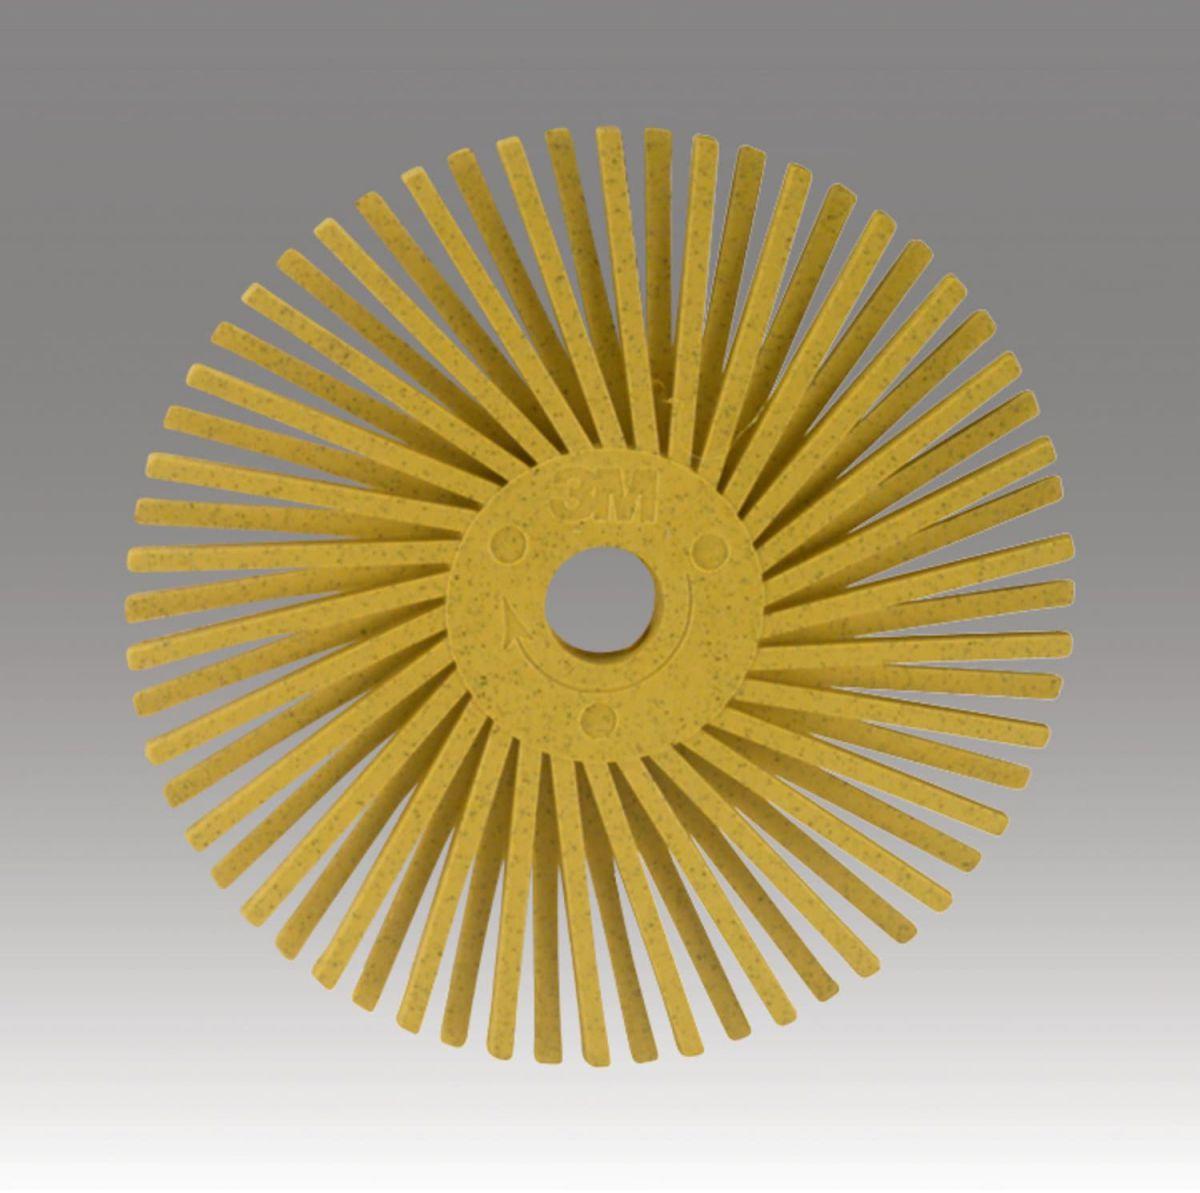 3m scotchbrite radial bristle schijf rbzb 75 mm x 953 mm p220 pn30128